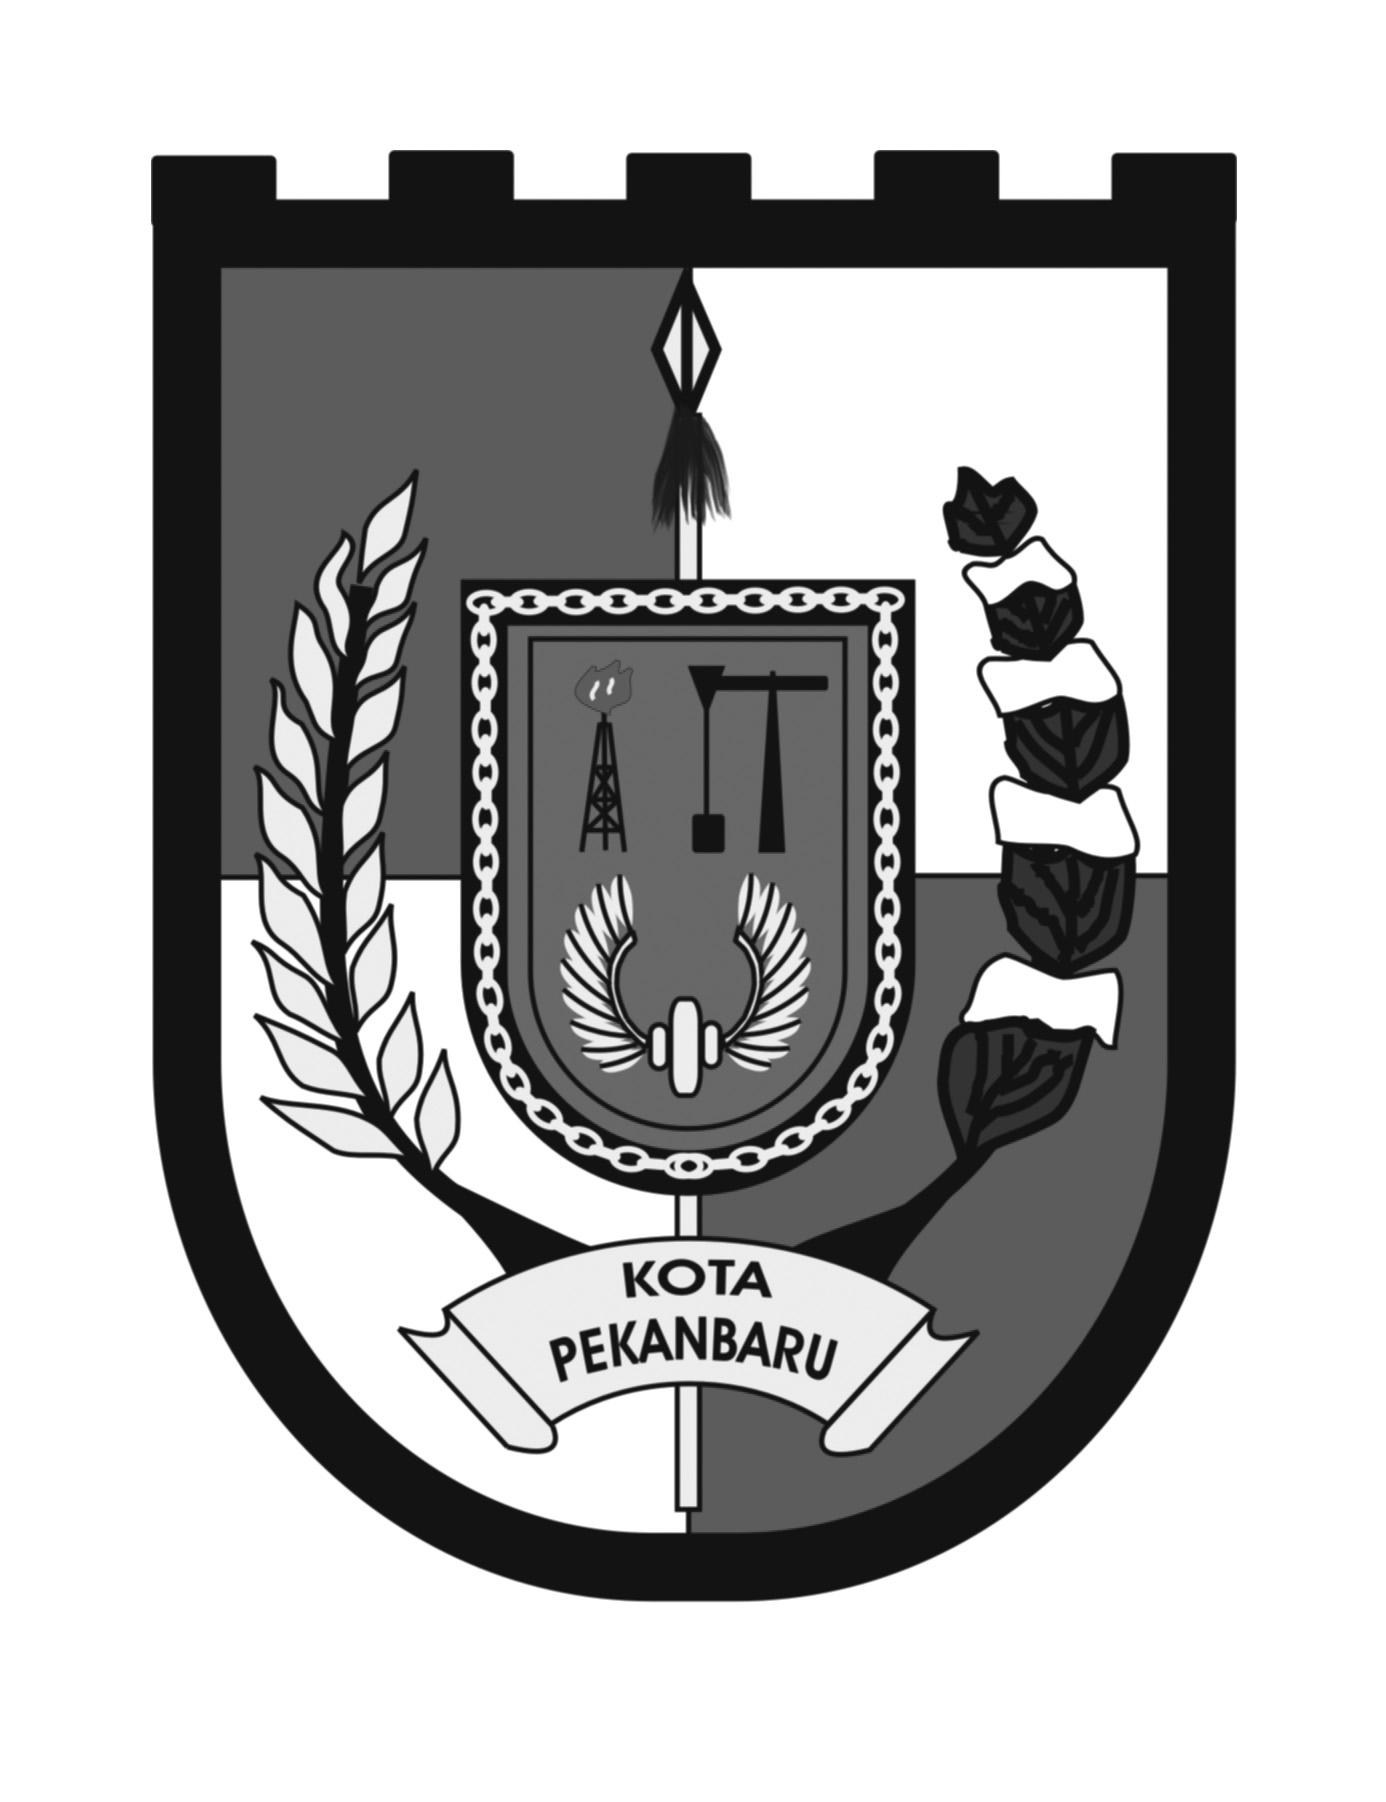 Logo Kota Pekanbaru (Provinsi Riau, Indonesia) Original Grayscale